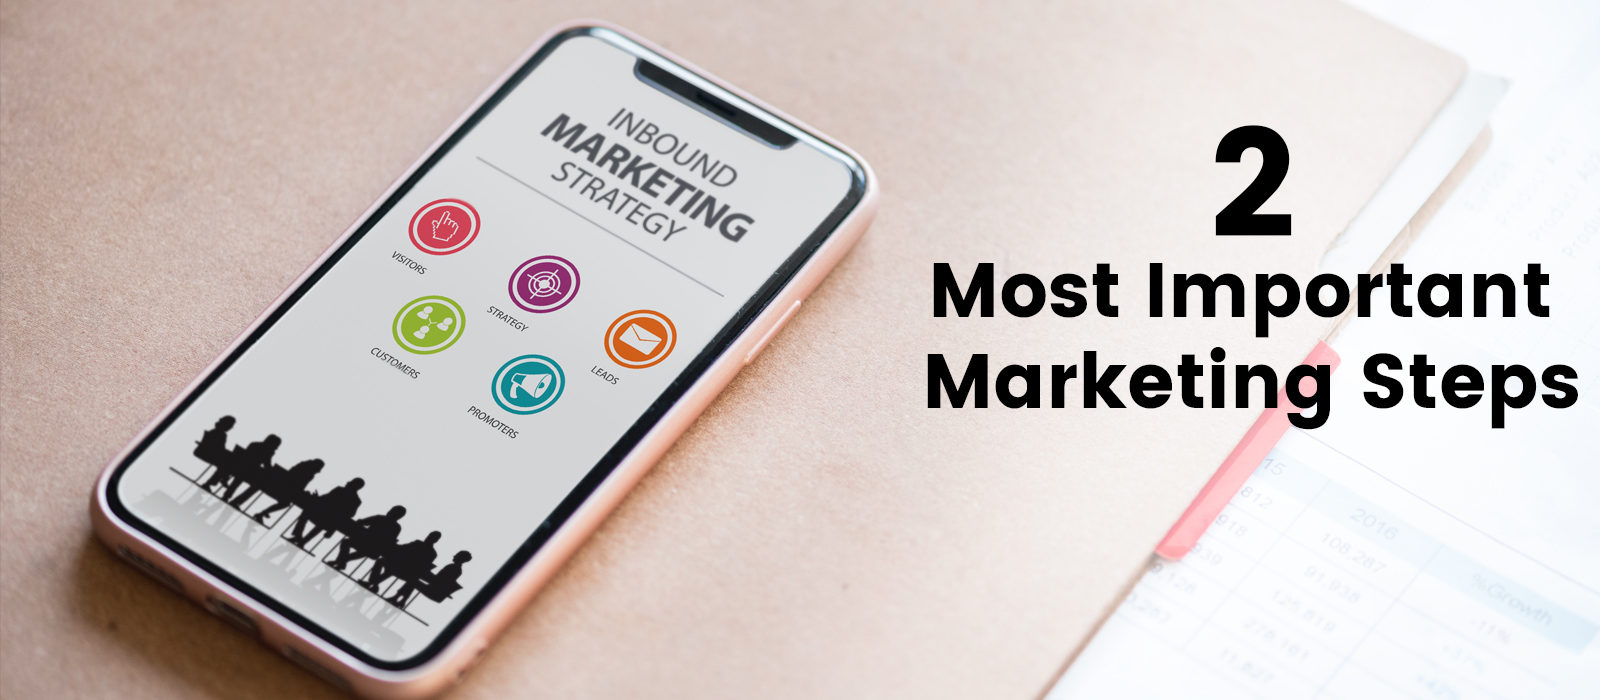 digital-marketing-steps-course-pouya-eti